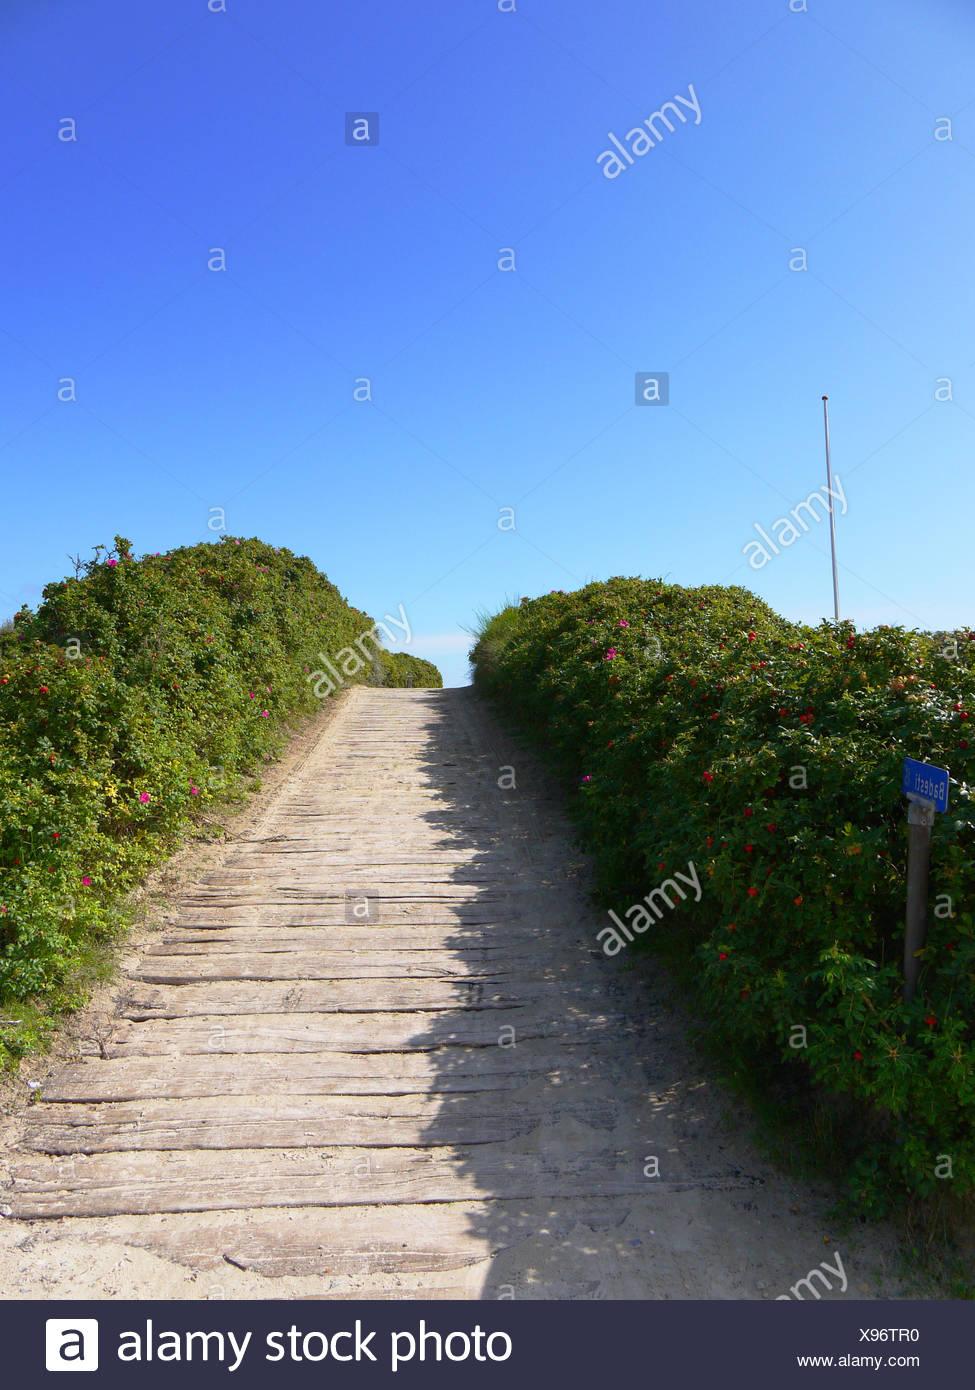 Rosehip lined beach path, Denmark - Stock Image